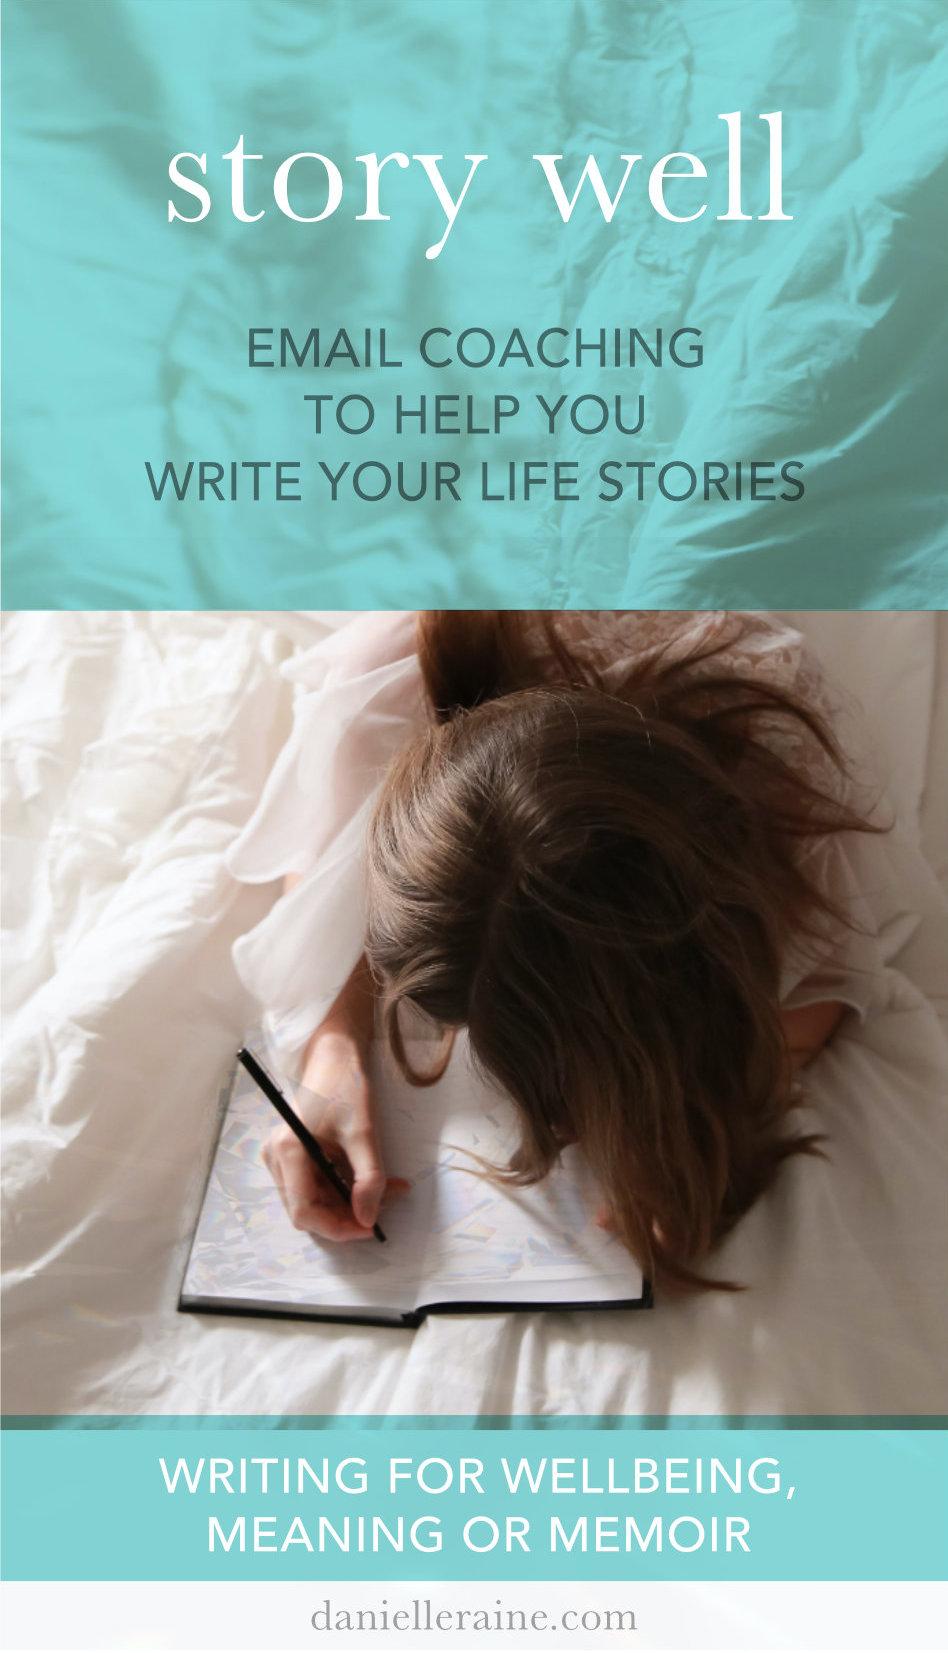 story well email coaching writing memoir pin